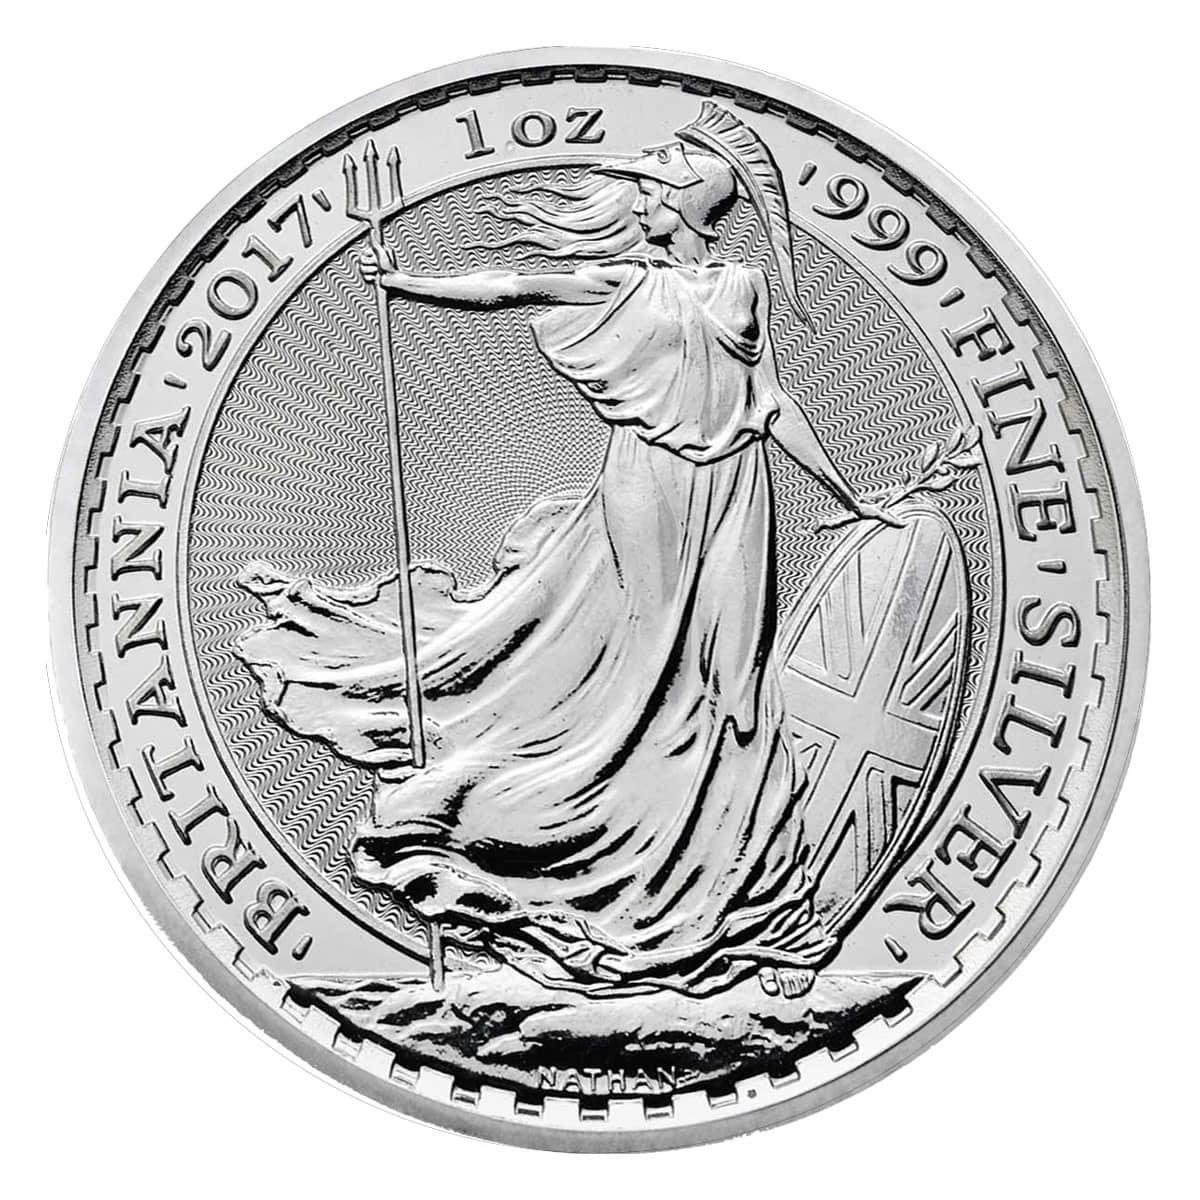 Silver Britannia Coin Great Britain 1oz 999